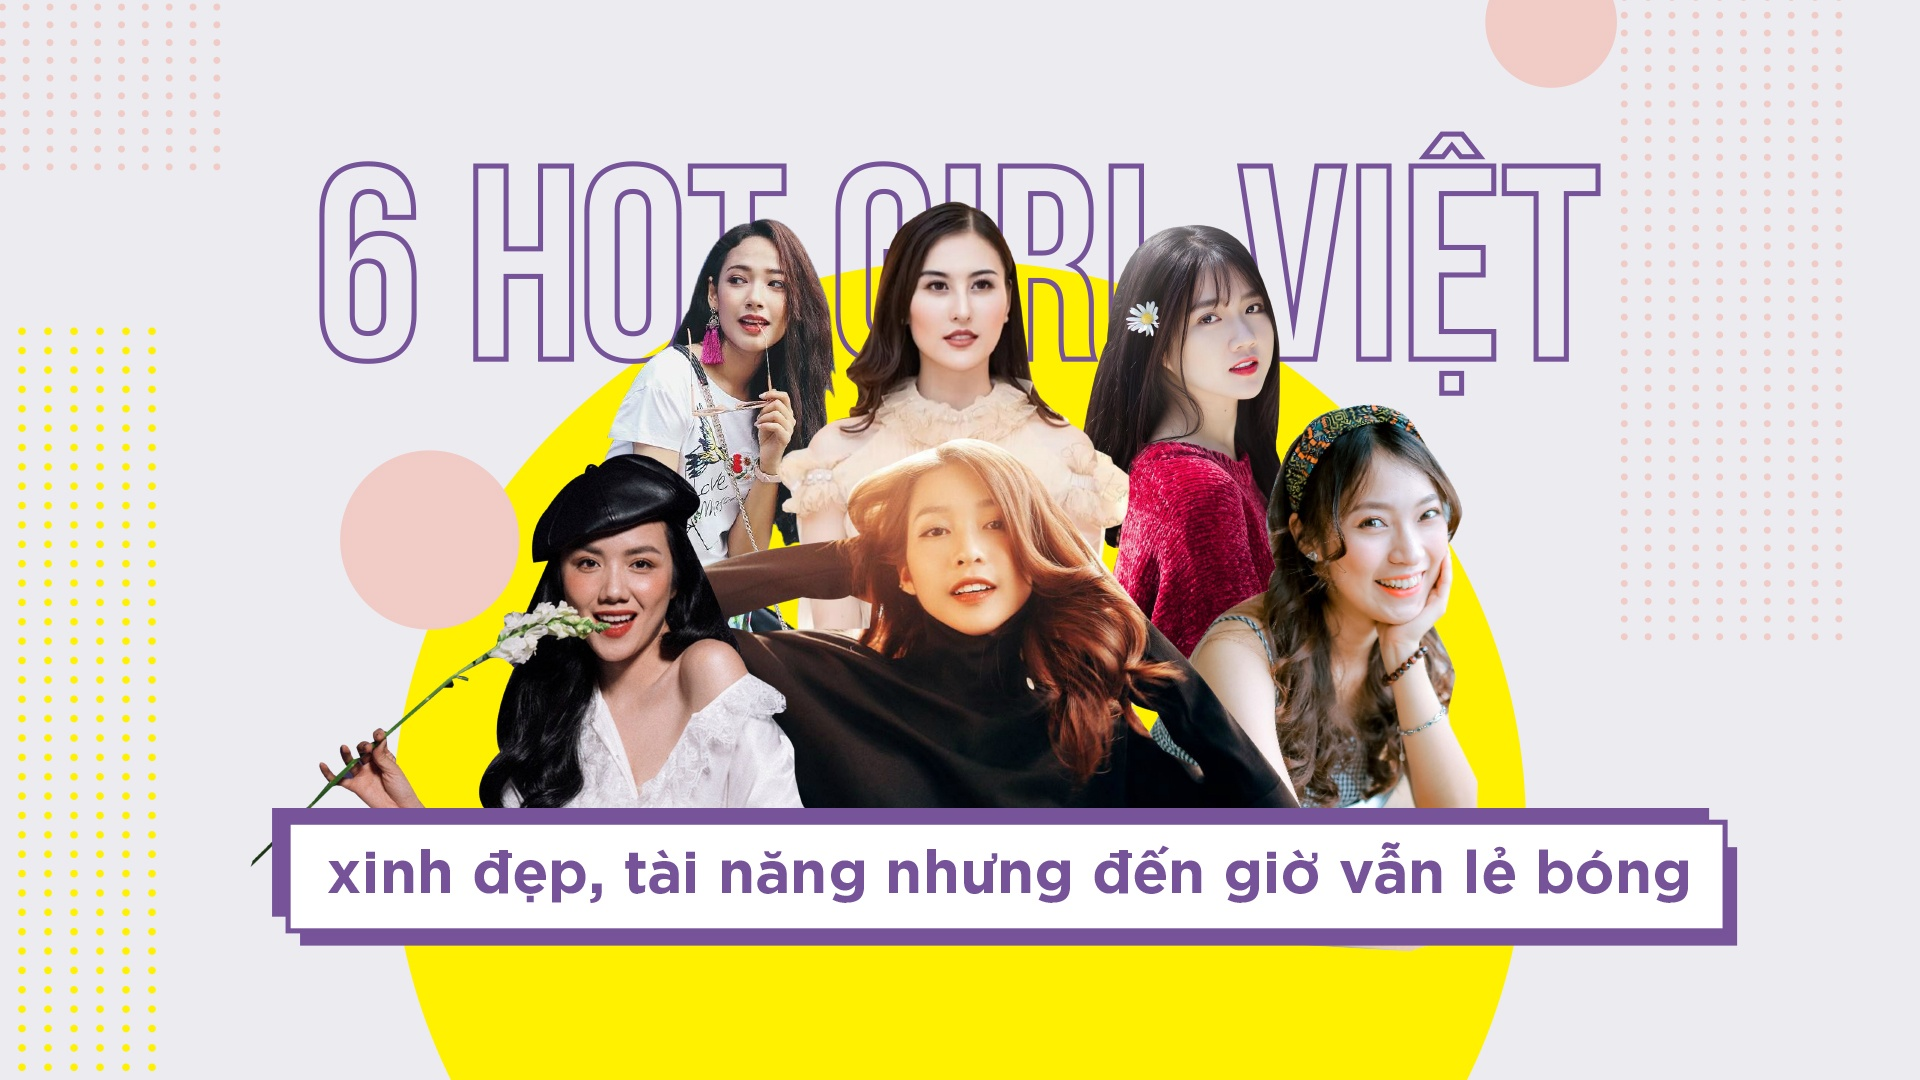 6 hot girl Viet xinh dep, tai nang nhung den gio van le bong hinh anh 1